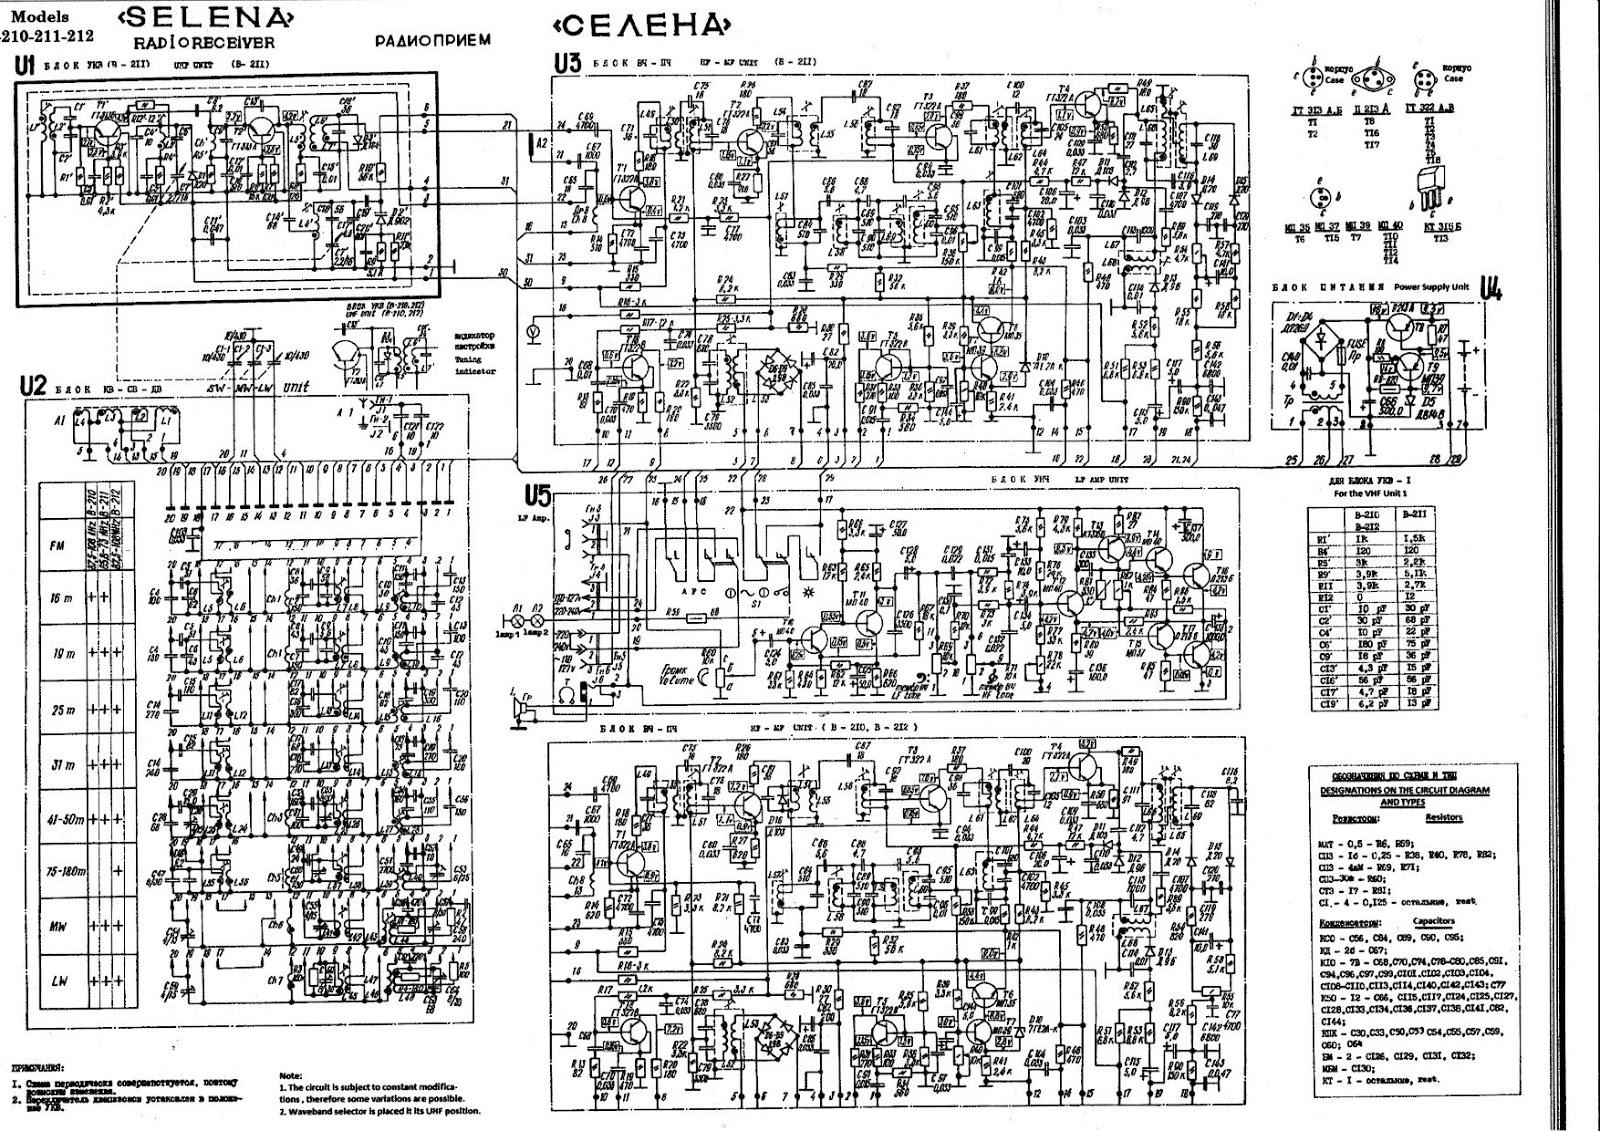 Schemi Elettrici Radio : Air radiorama: ricevitore multigamma selena b210 prodotta in urss